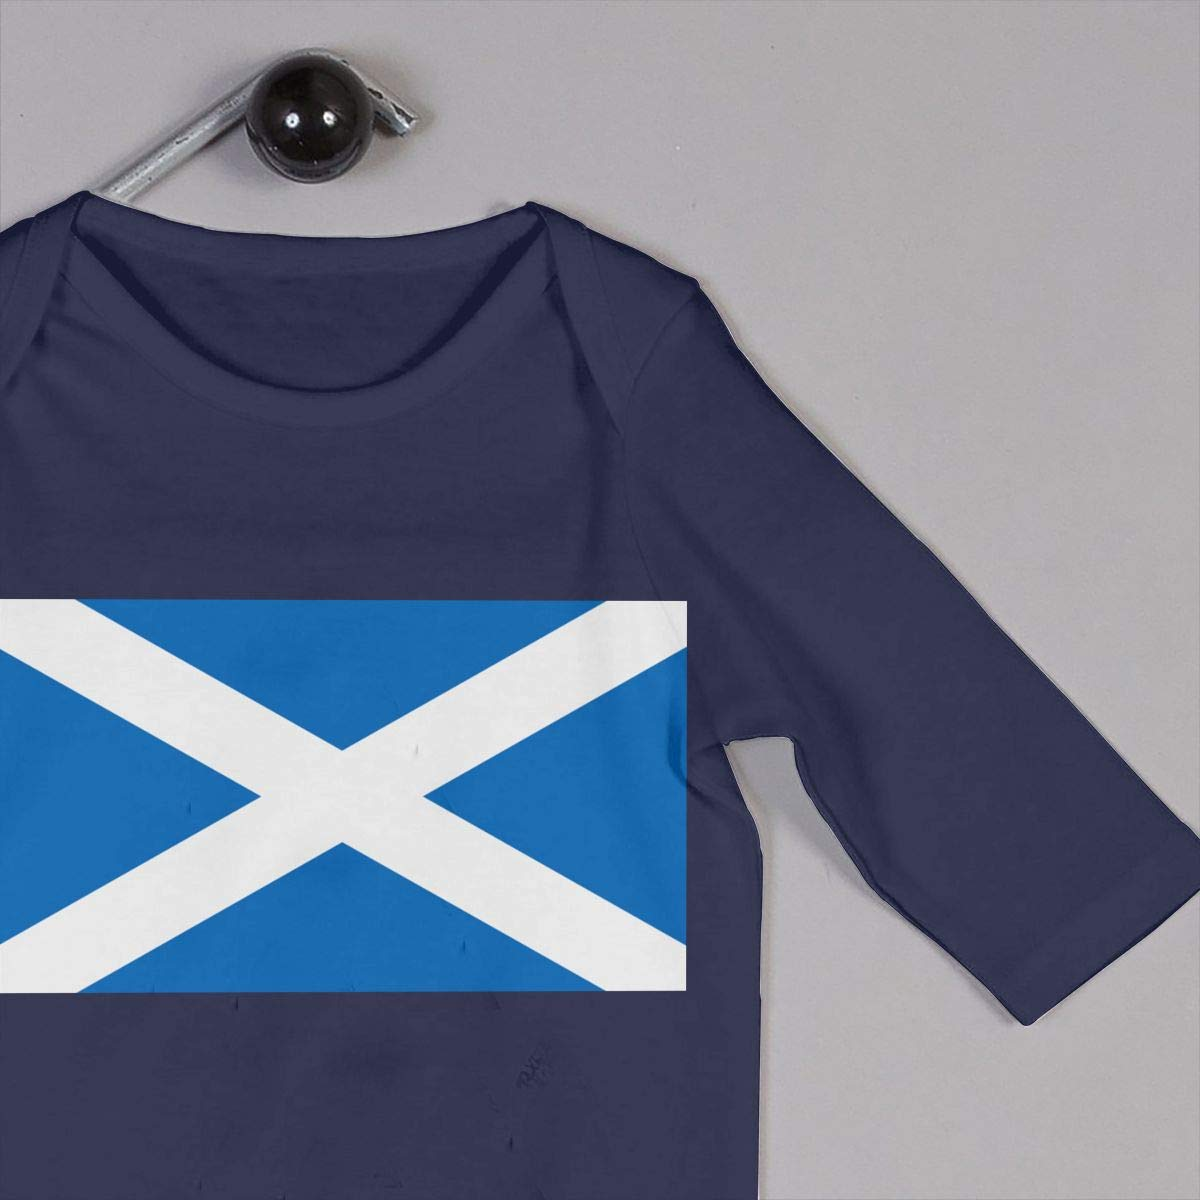 Mri-le1 Baby Boy Girl Bodysuits Scotland Flag Infant Long Sleeve Romper Jumpsuit